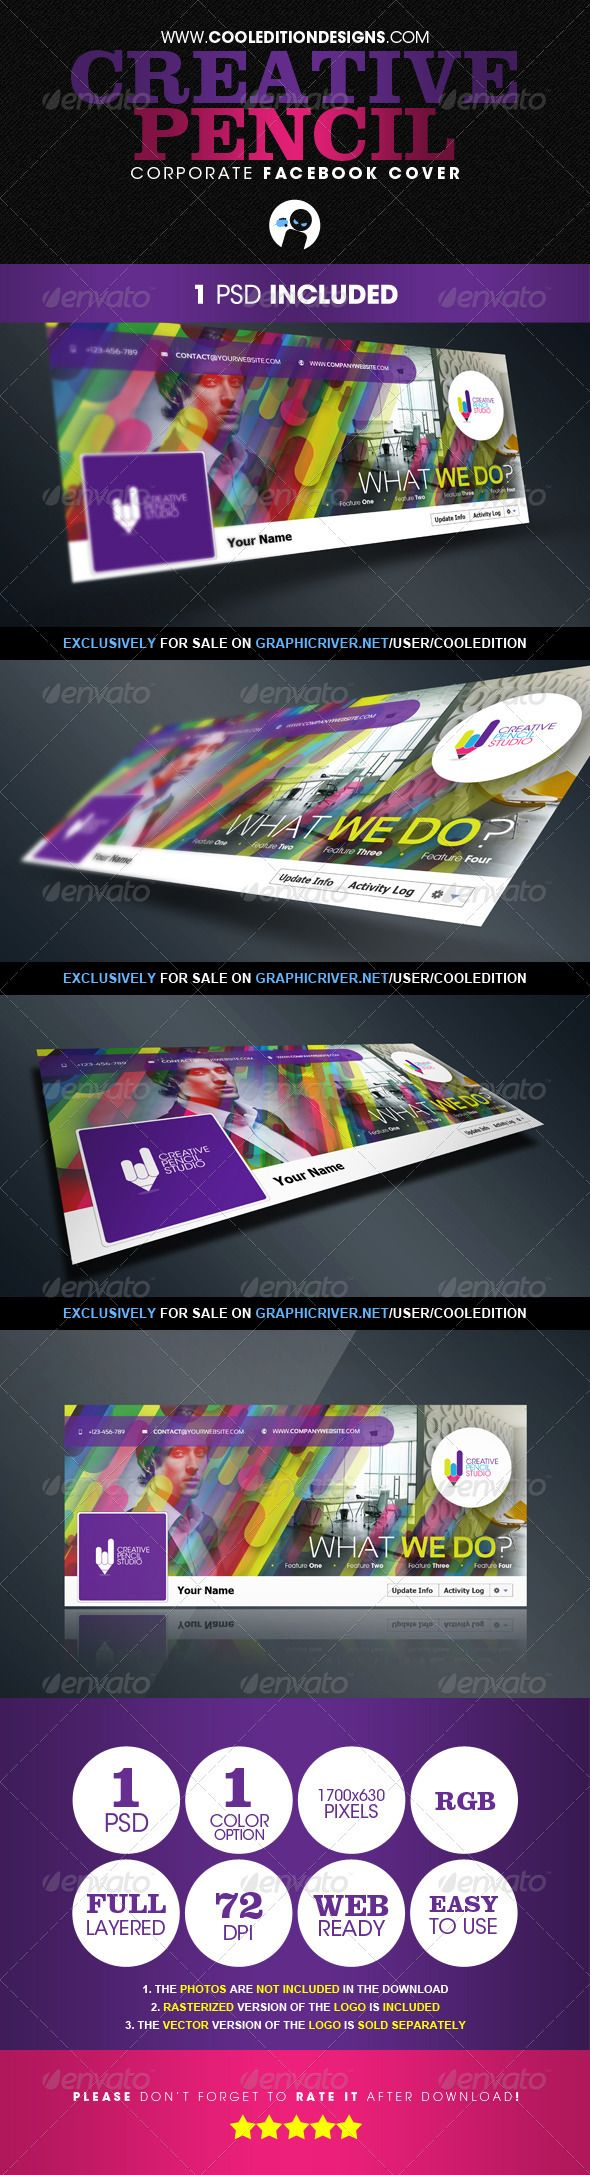 Creative Pencil - Corporate Facebook Cover - GraphicRiver Item for Sale